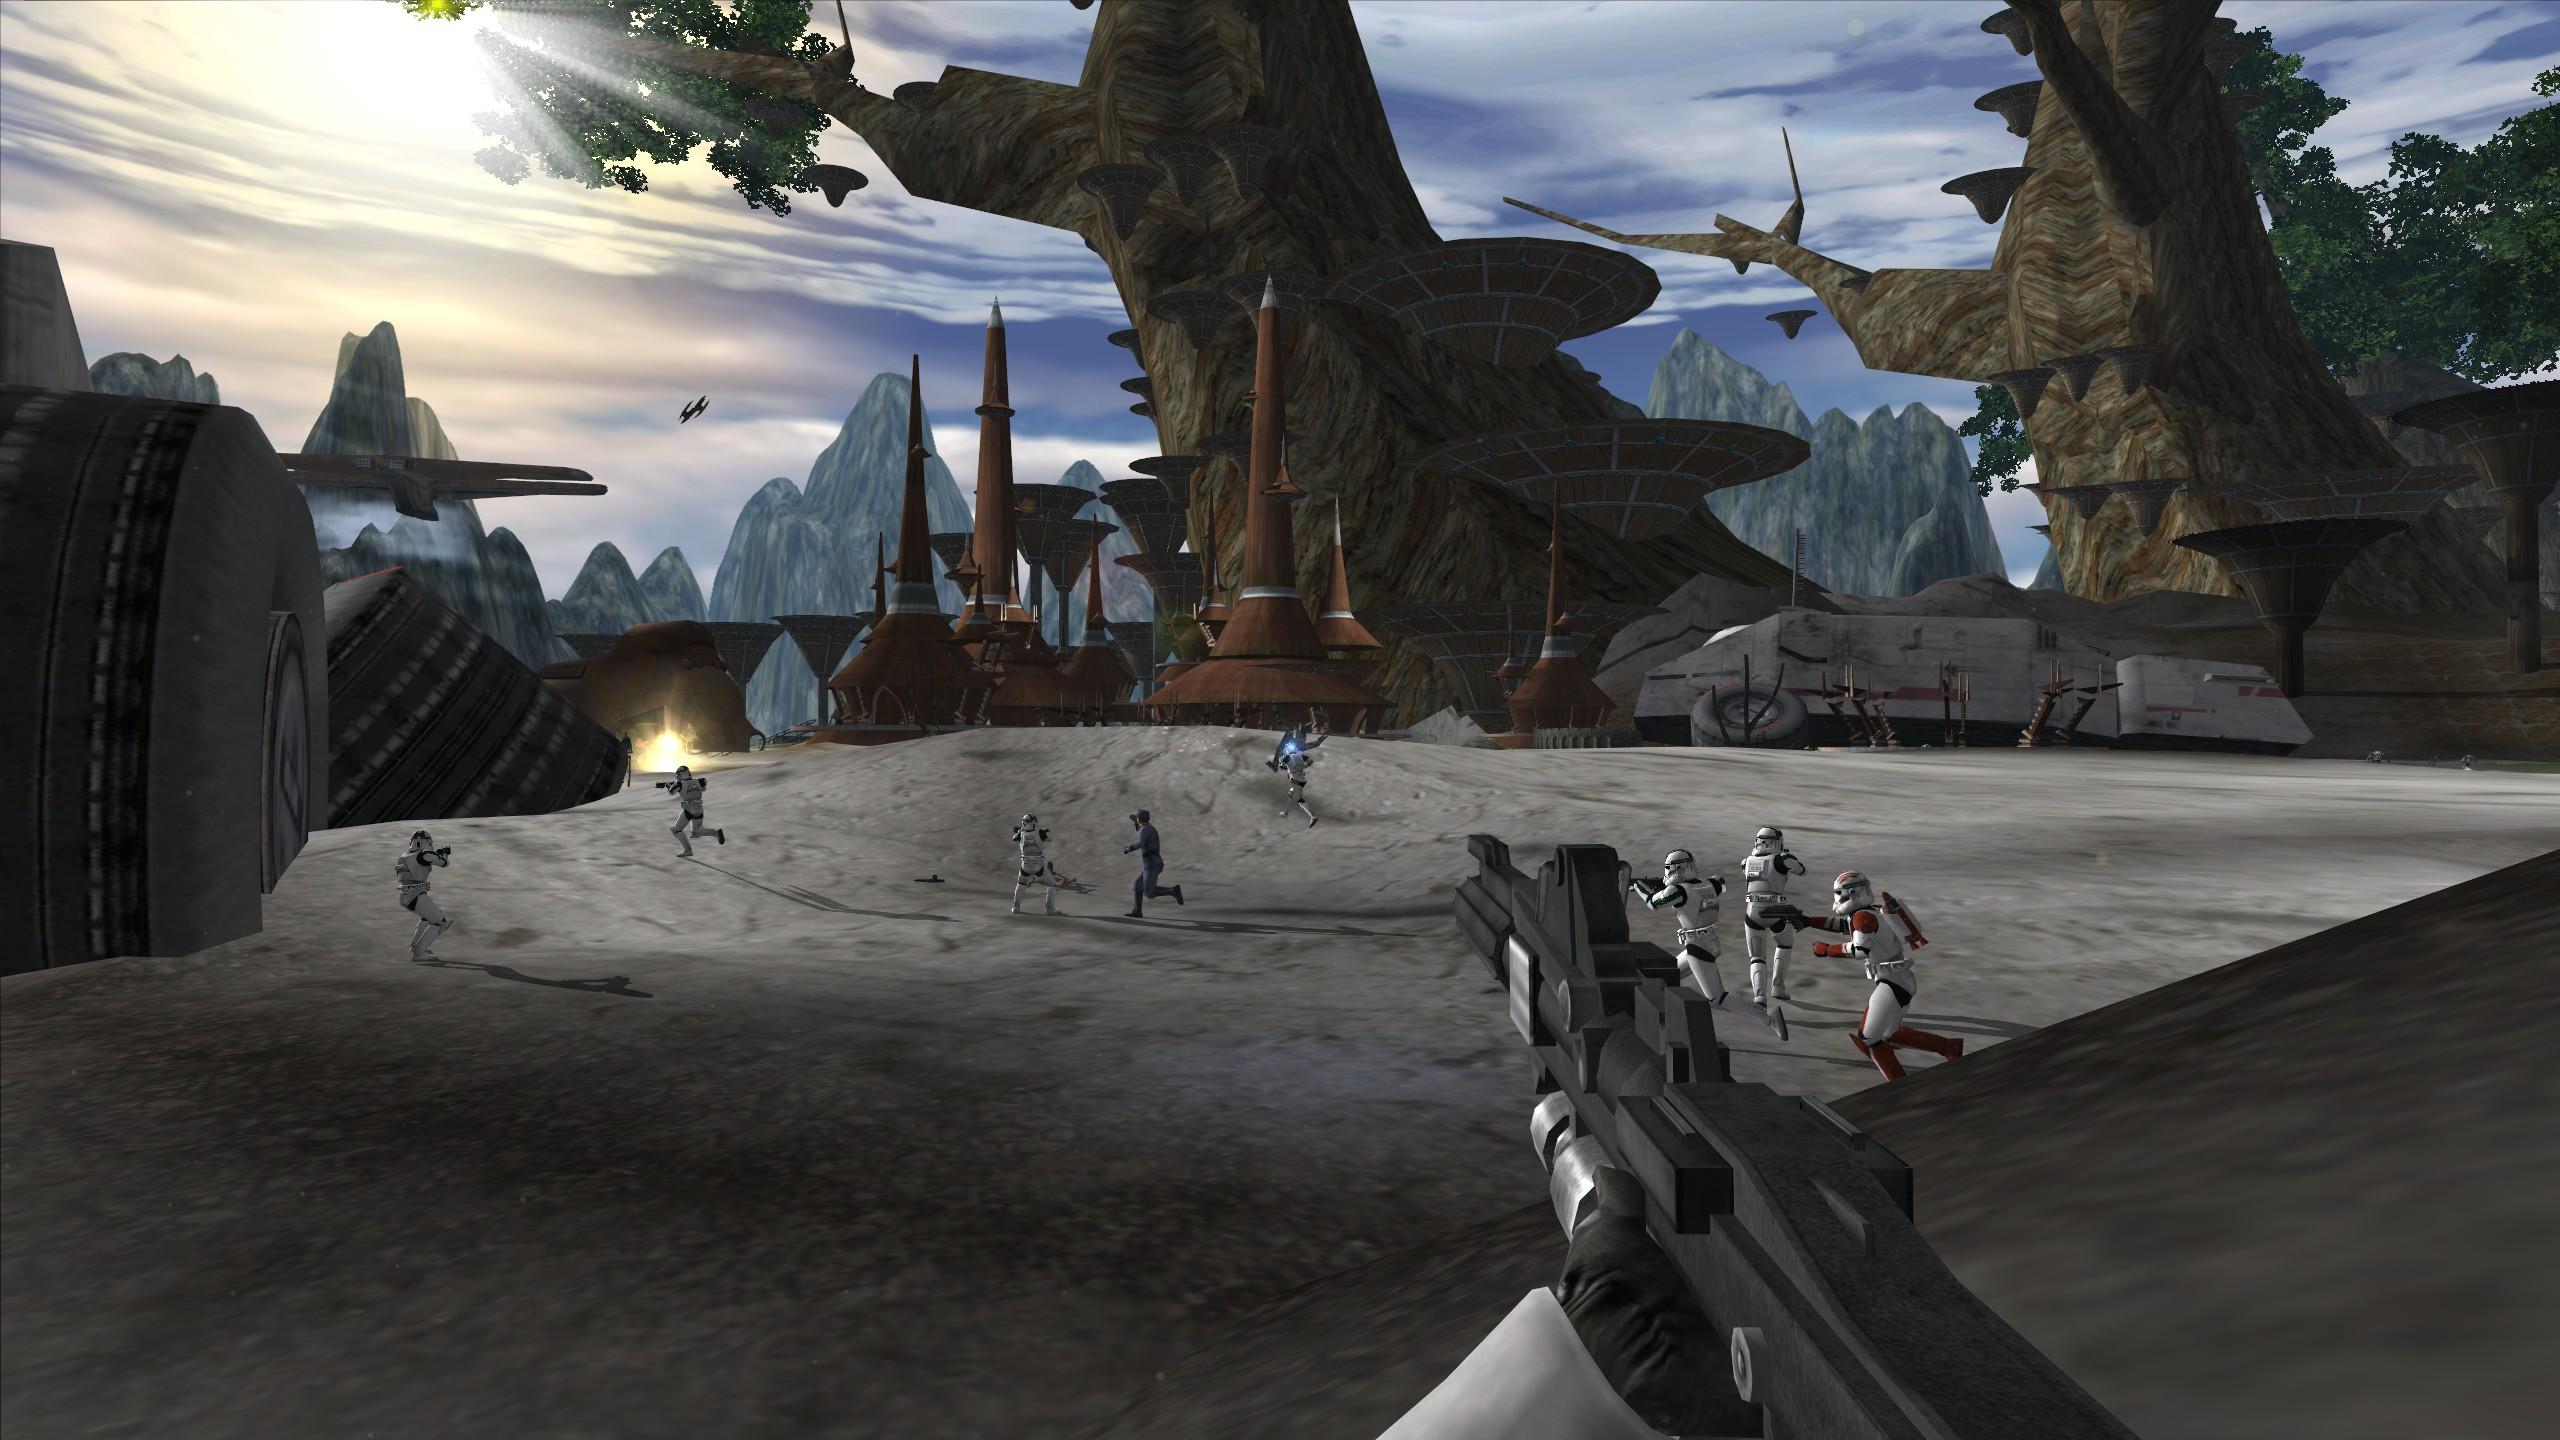 Kashyyyk Kachirho Beach File Star Wars Battlefront Ii Demake Mod For Star Wars Battlefront Ii Mod Db